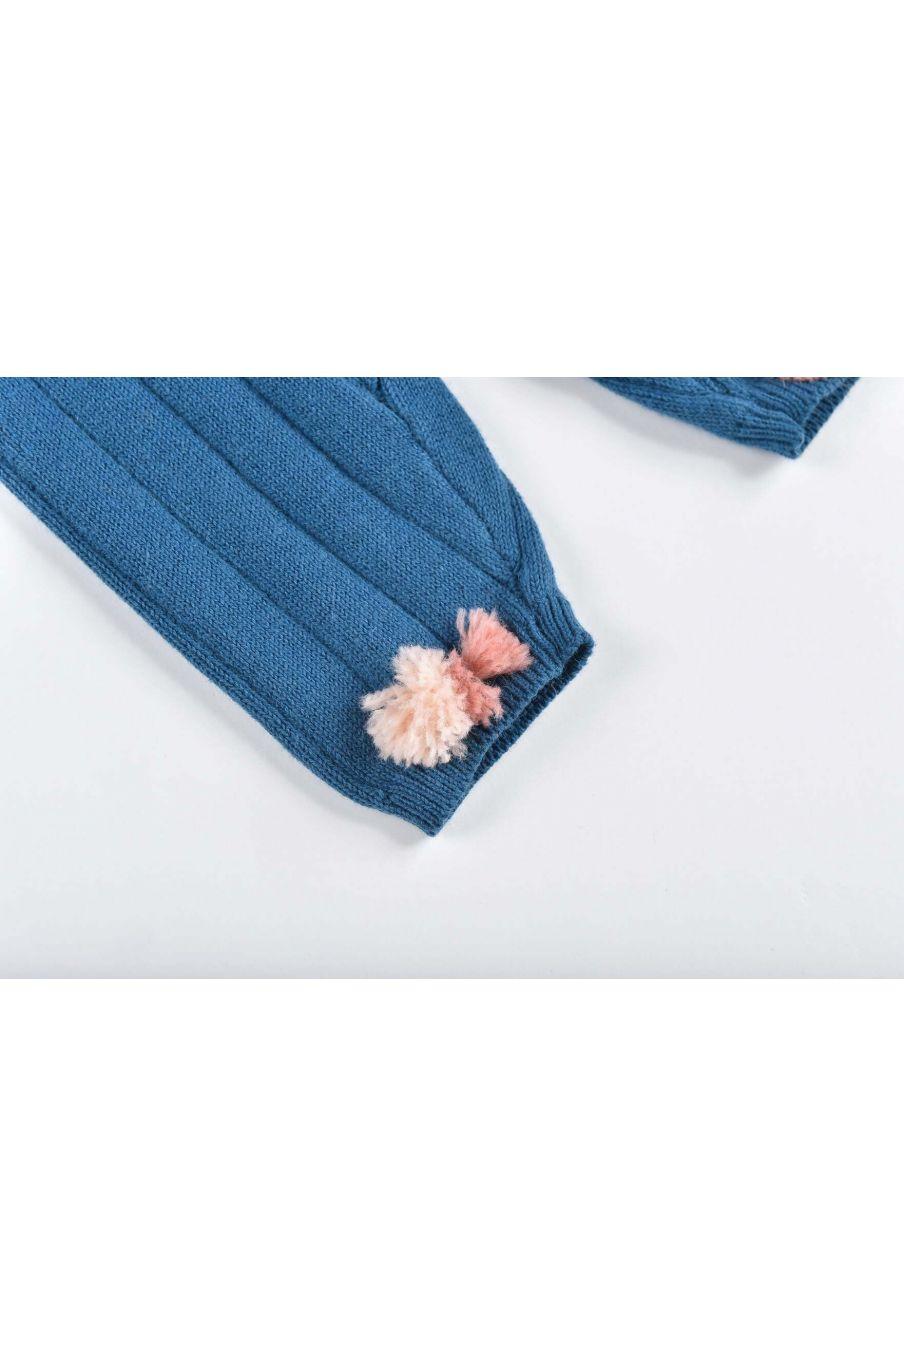 leggings fille moldavia blue - louise misha